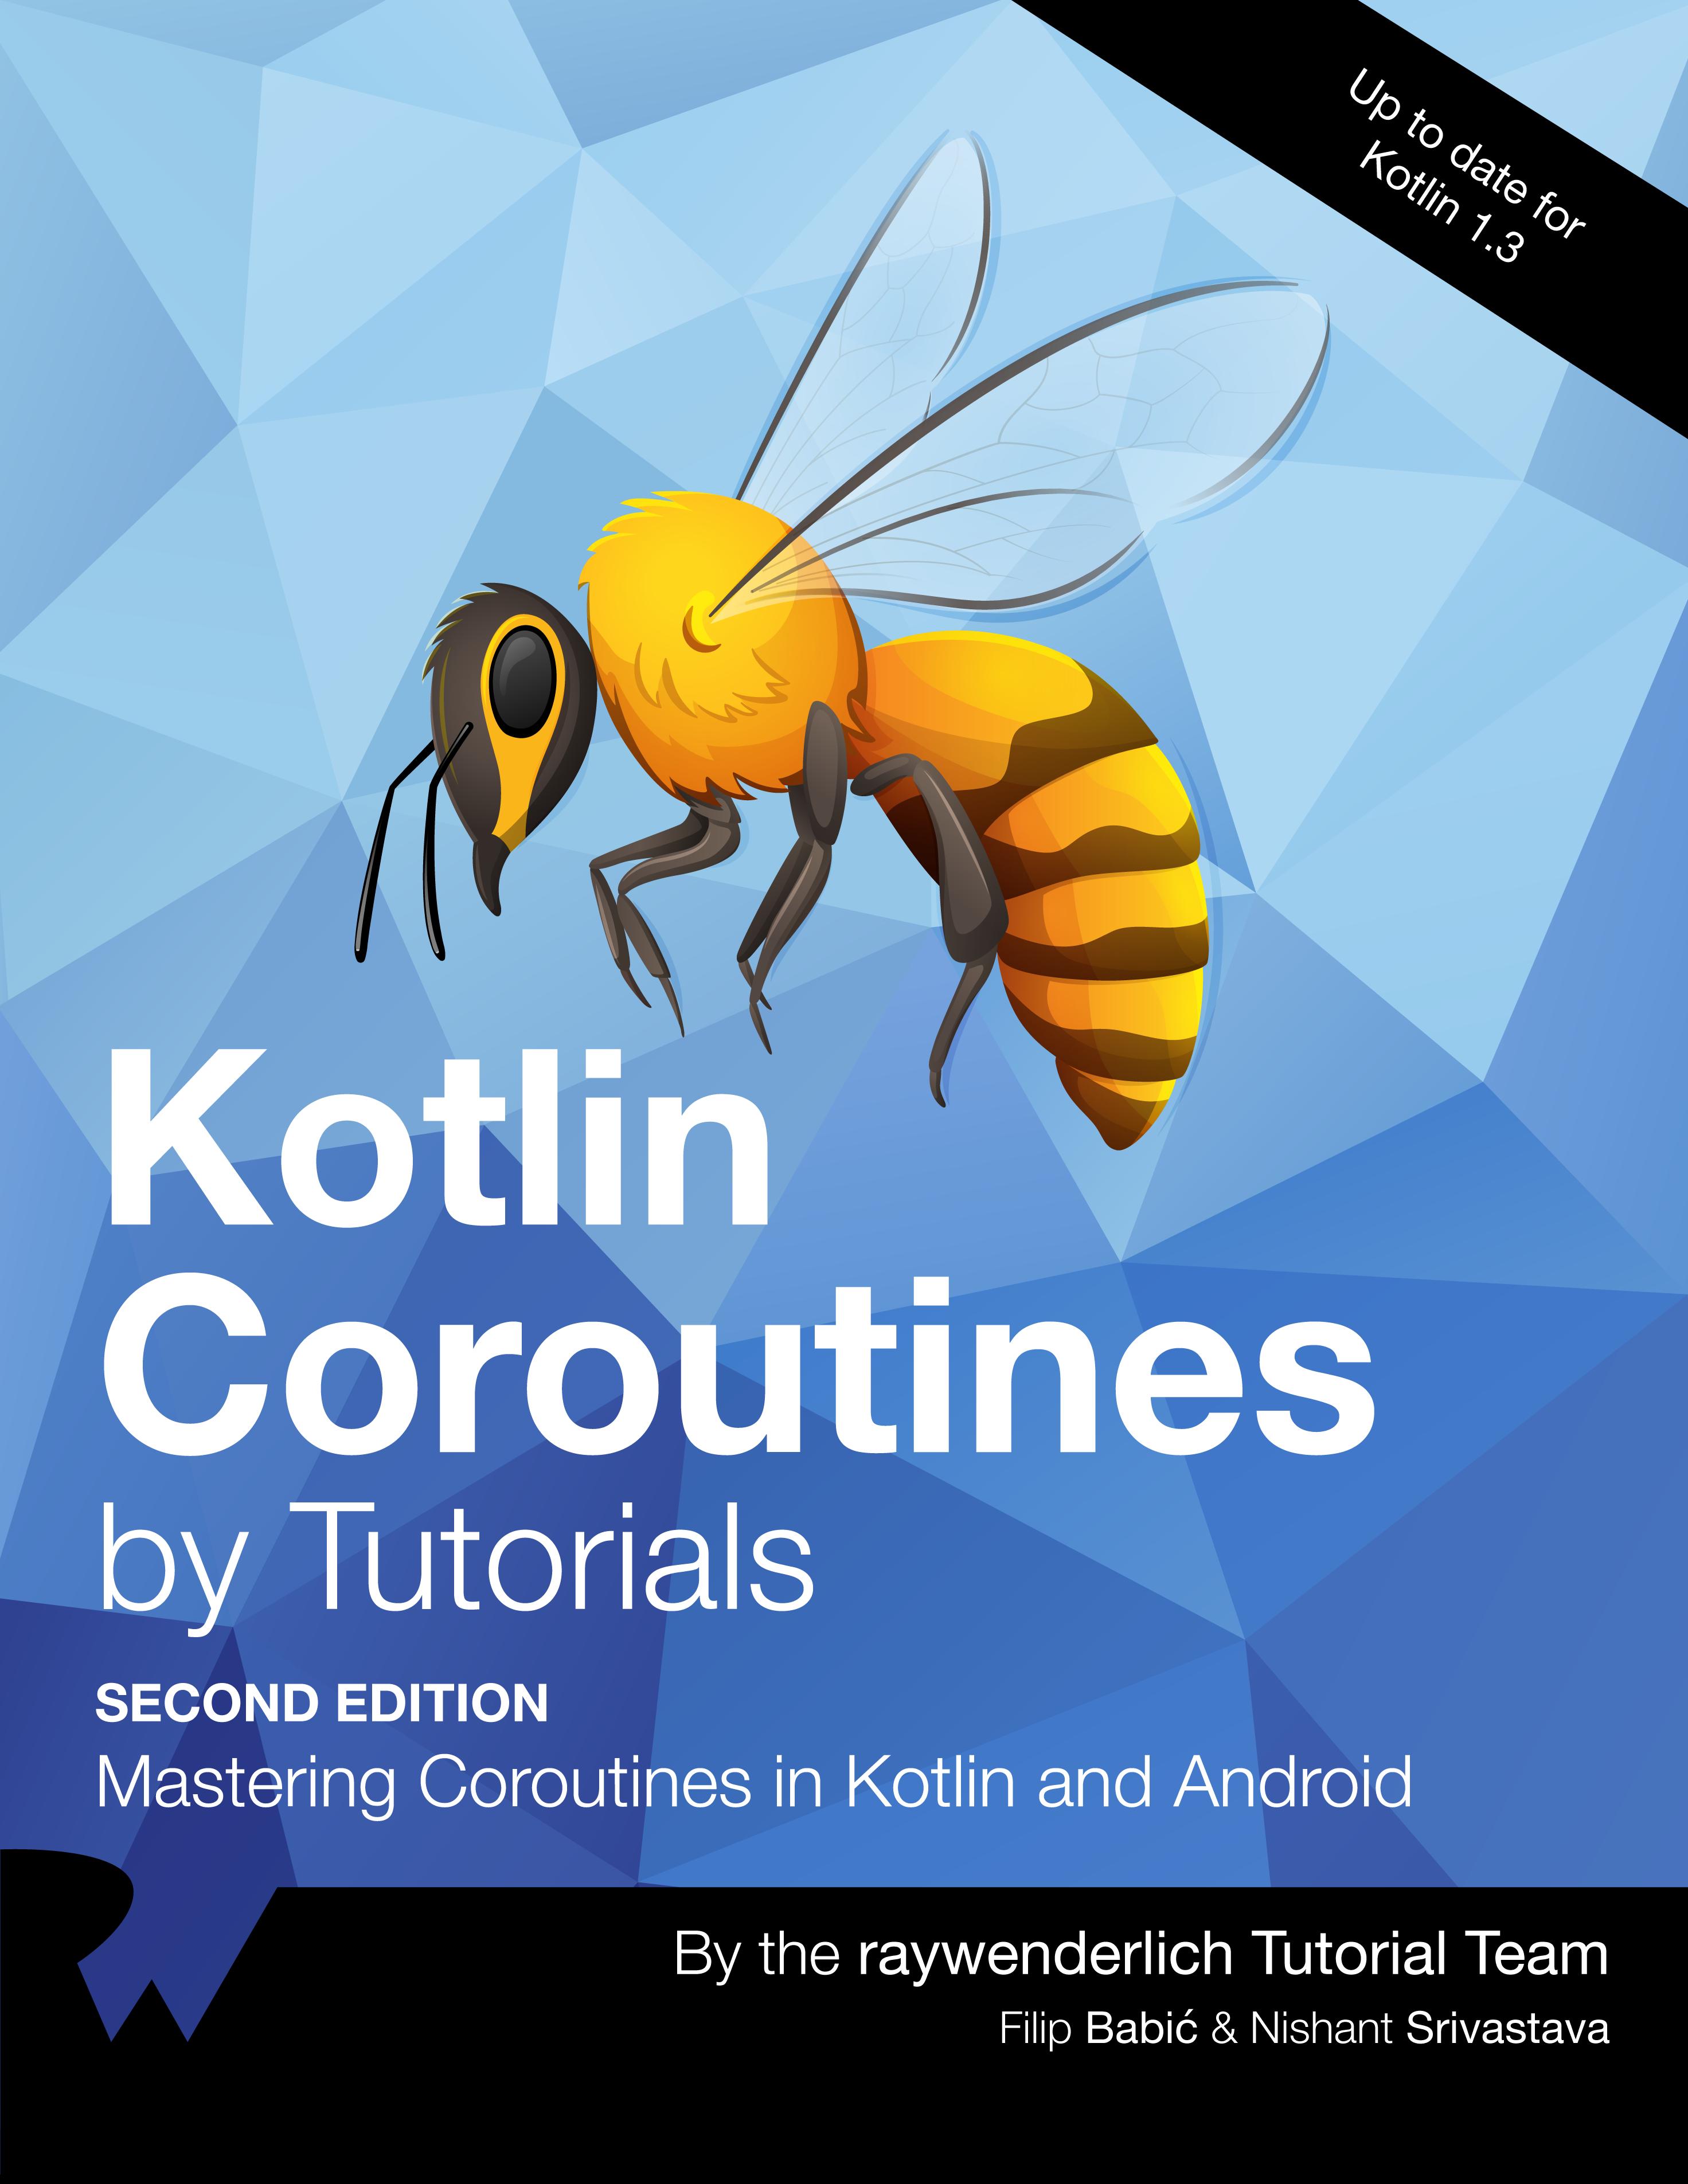 Kotlin Coroutines by Tutorials